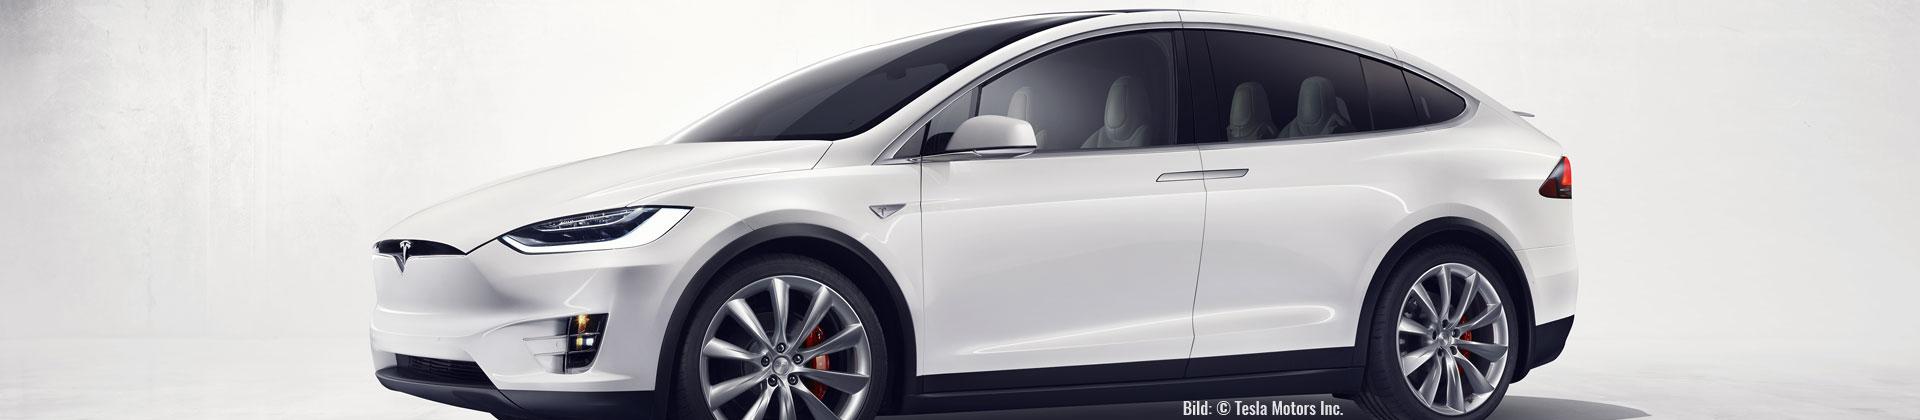 Tesla Model X (Bild: © Tesla Motors Inc.)